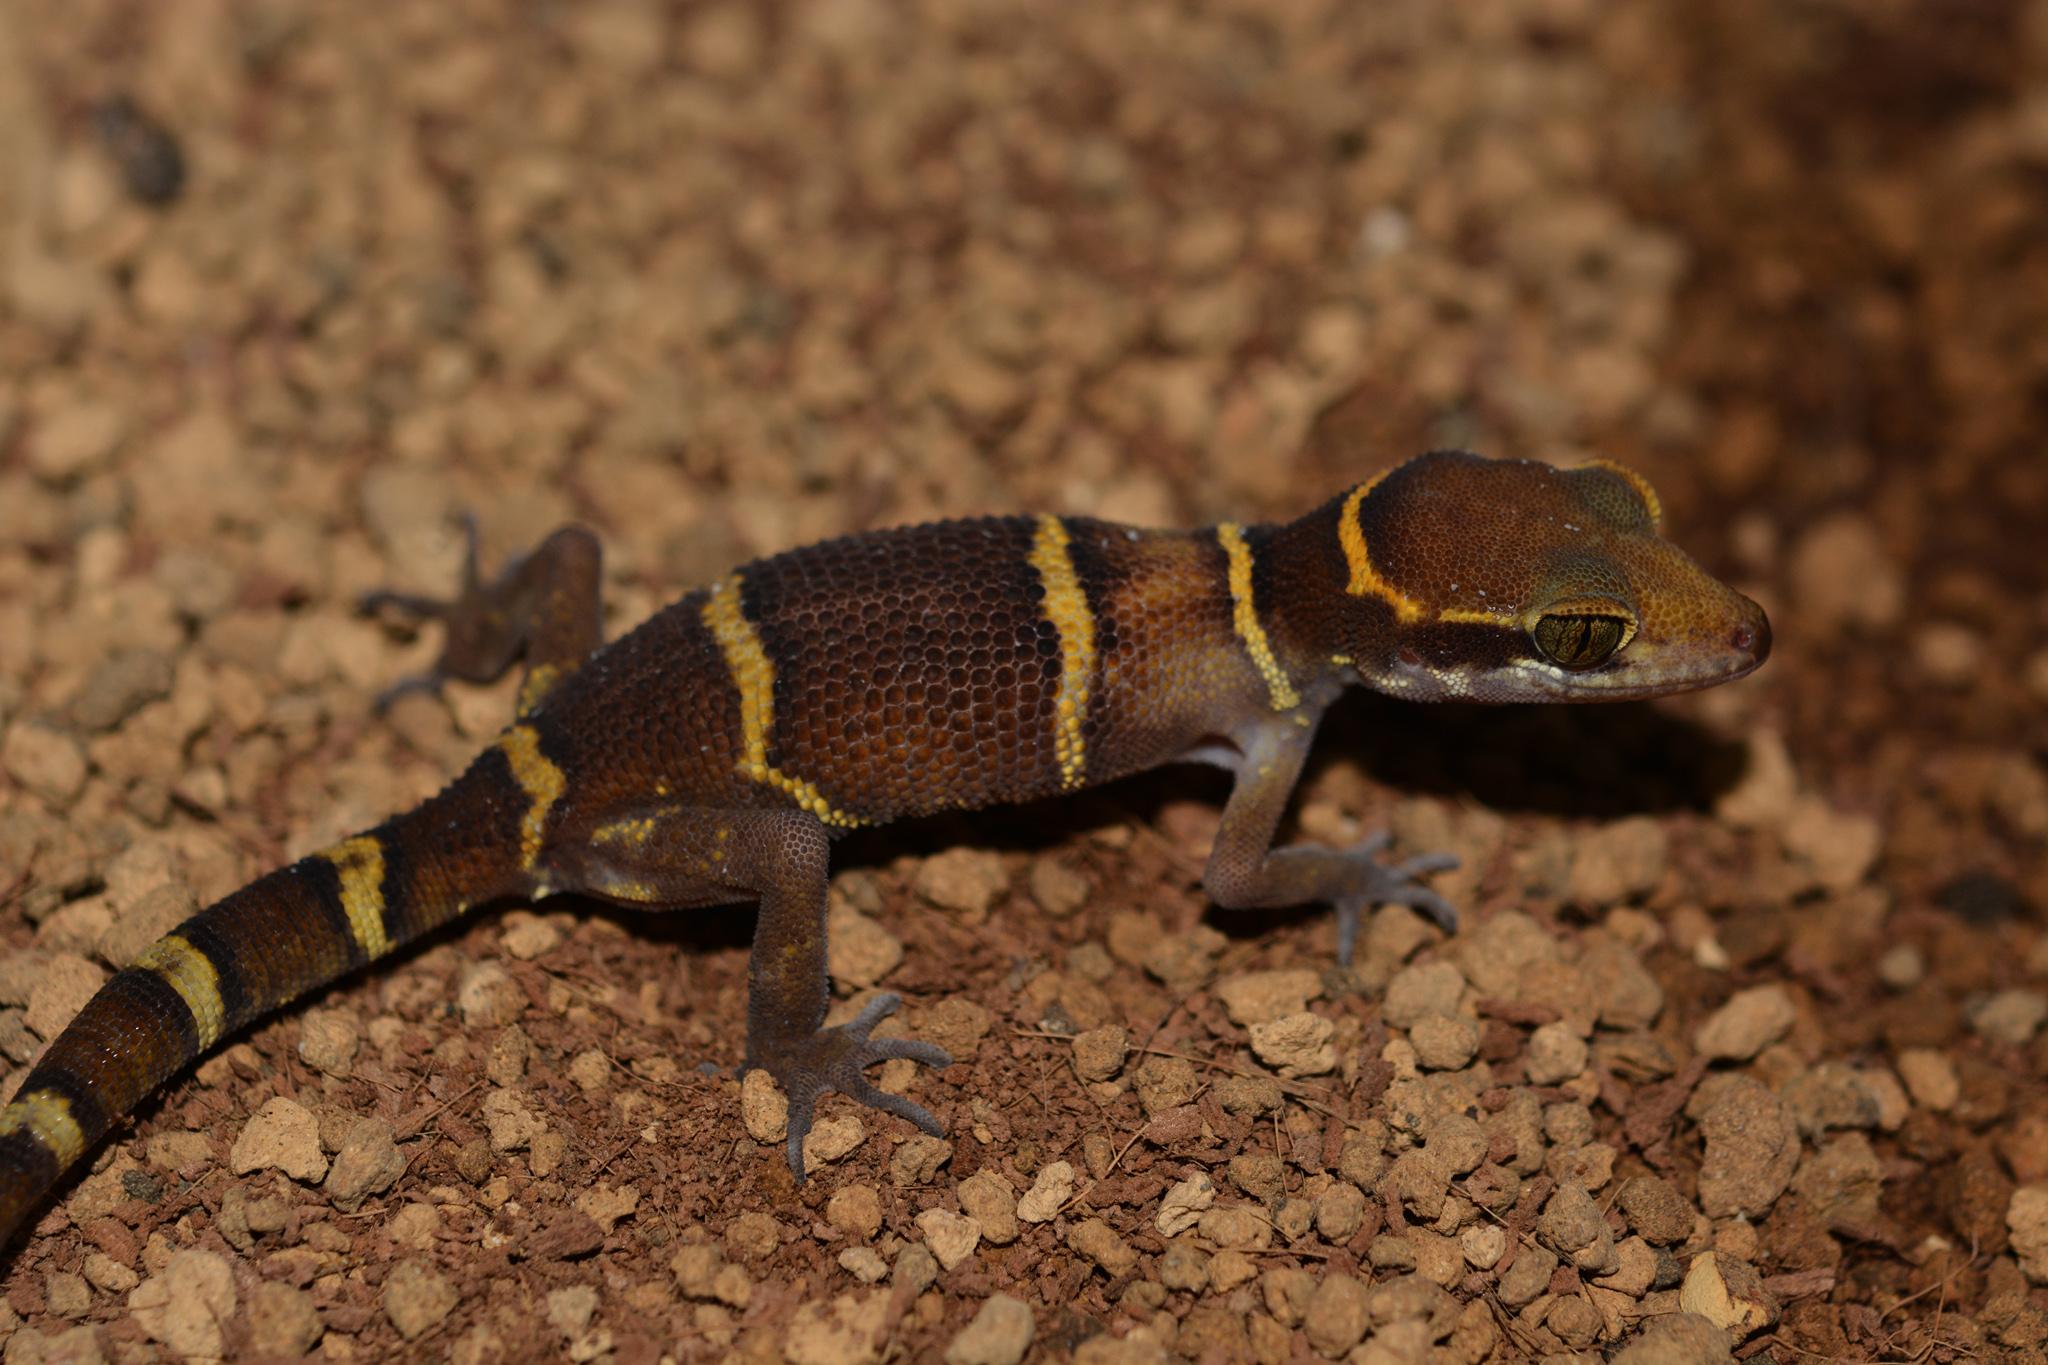 geckoella_deccanensis_female01.jpg